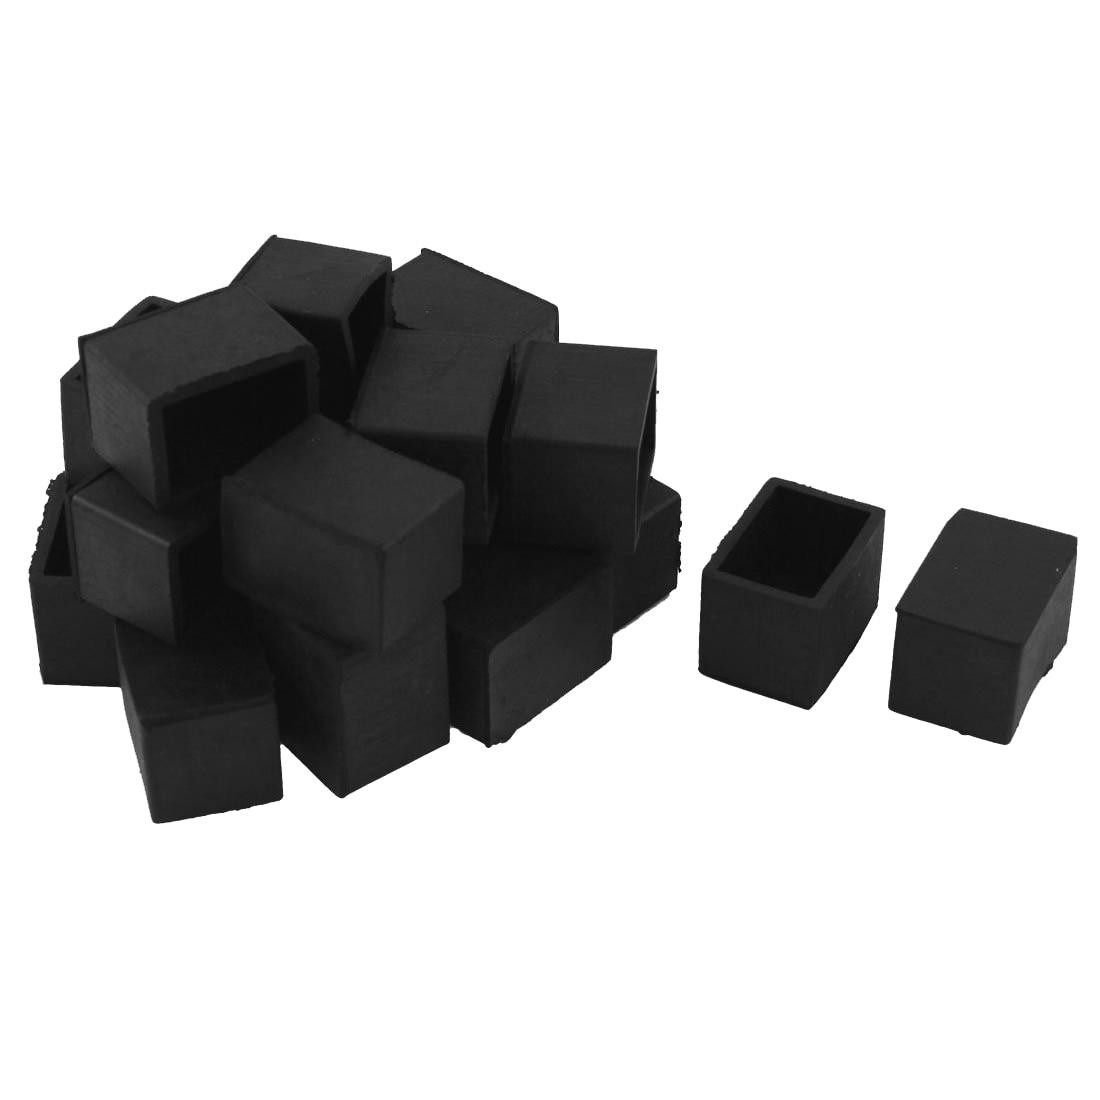 HOT GCZW-20 Pcs Furniture Table Leg Rubber Foot Covers 20mm X 30mm Black